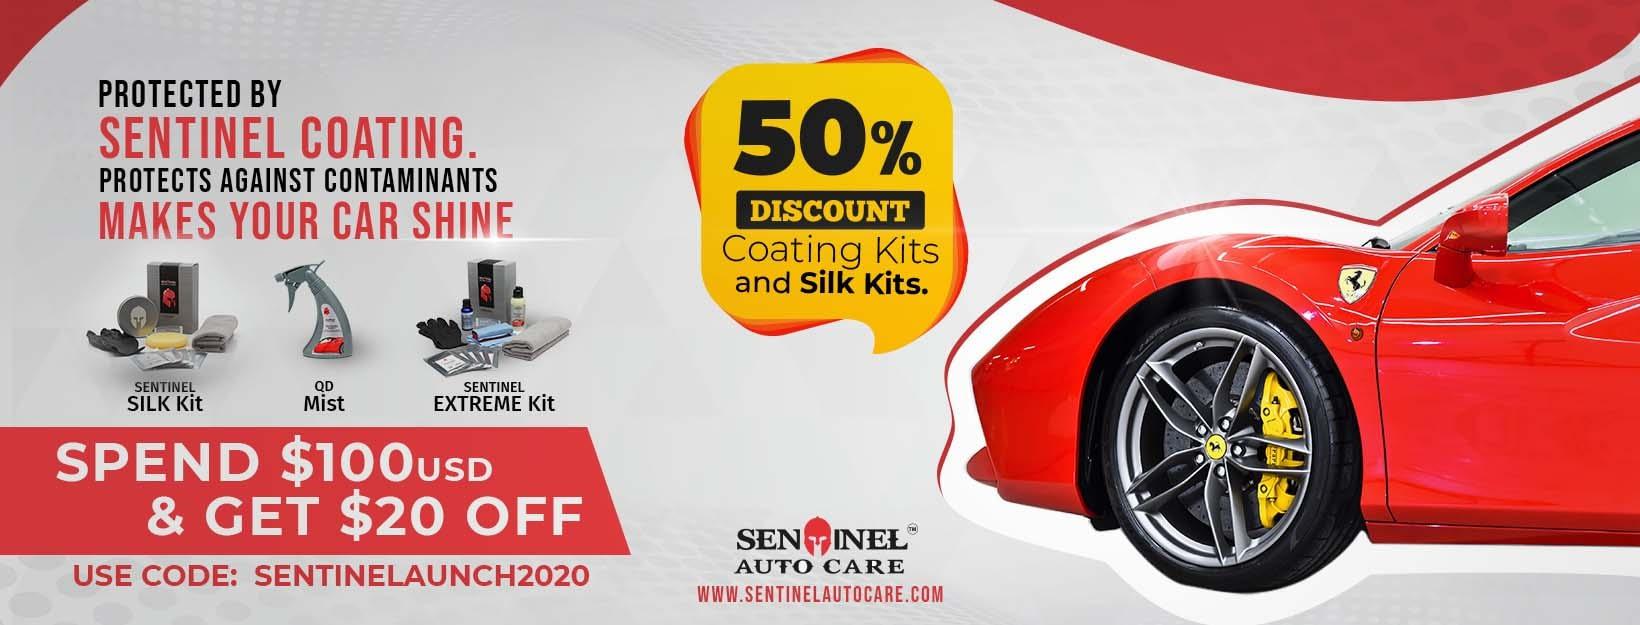 Sentinel Autocare Promotion